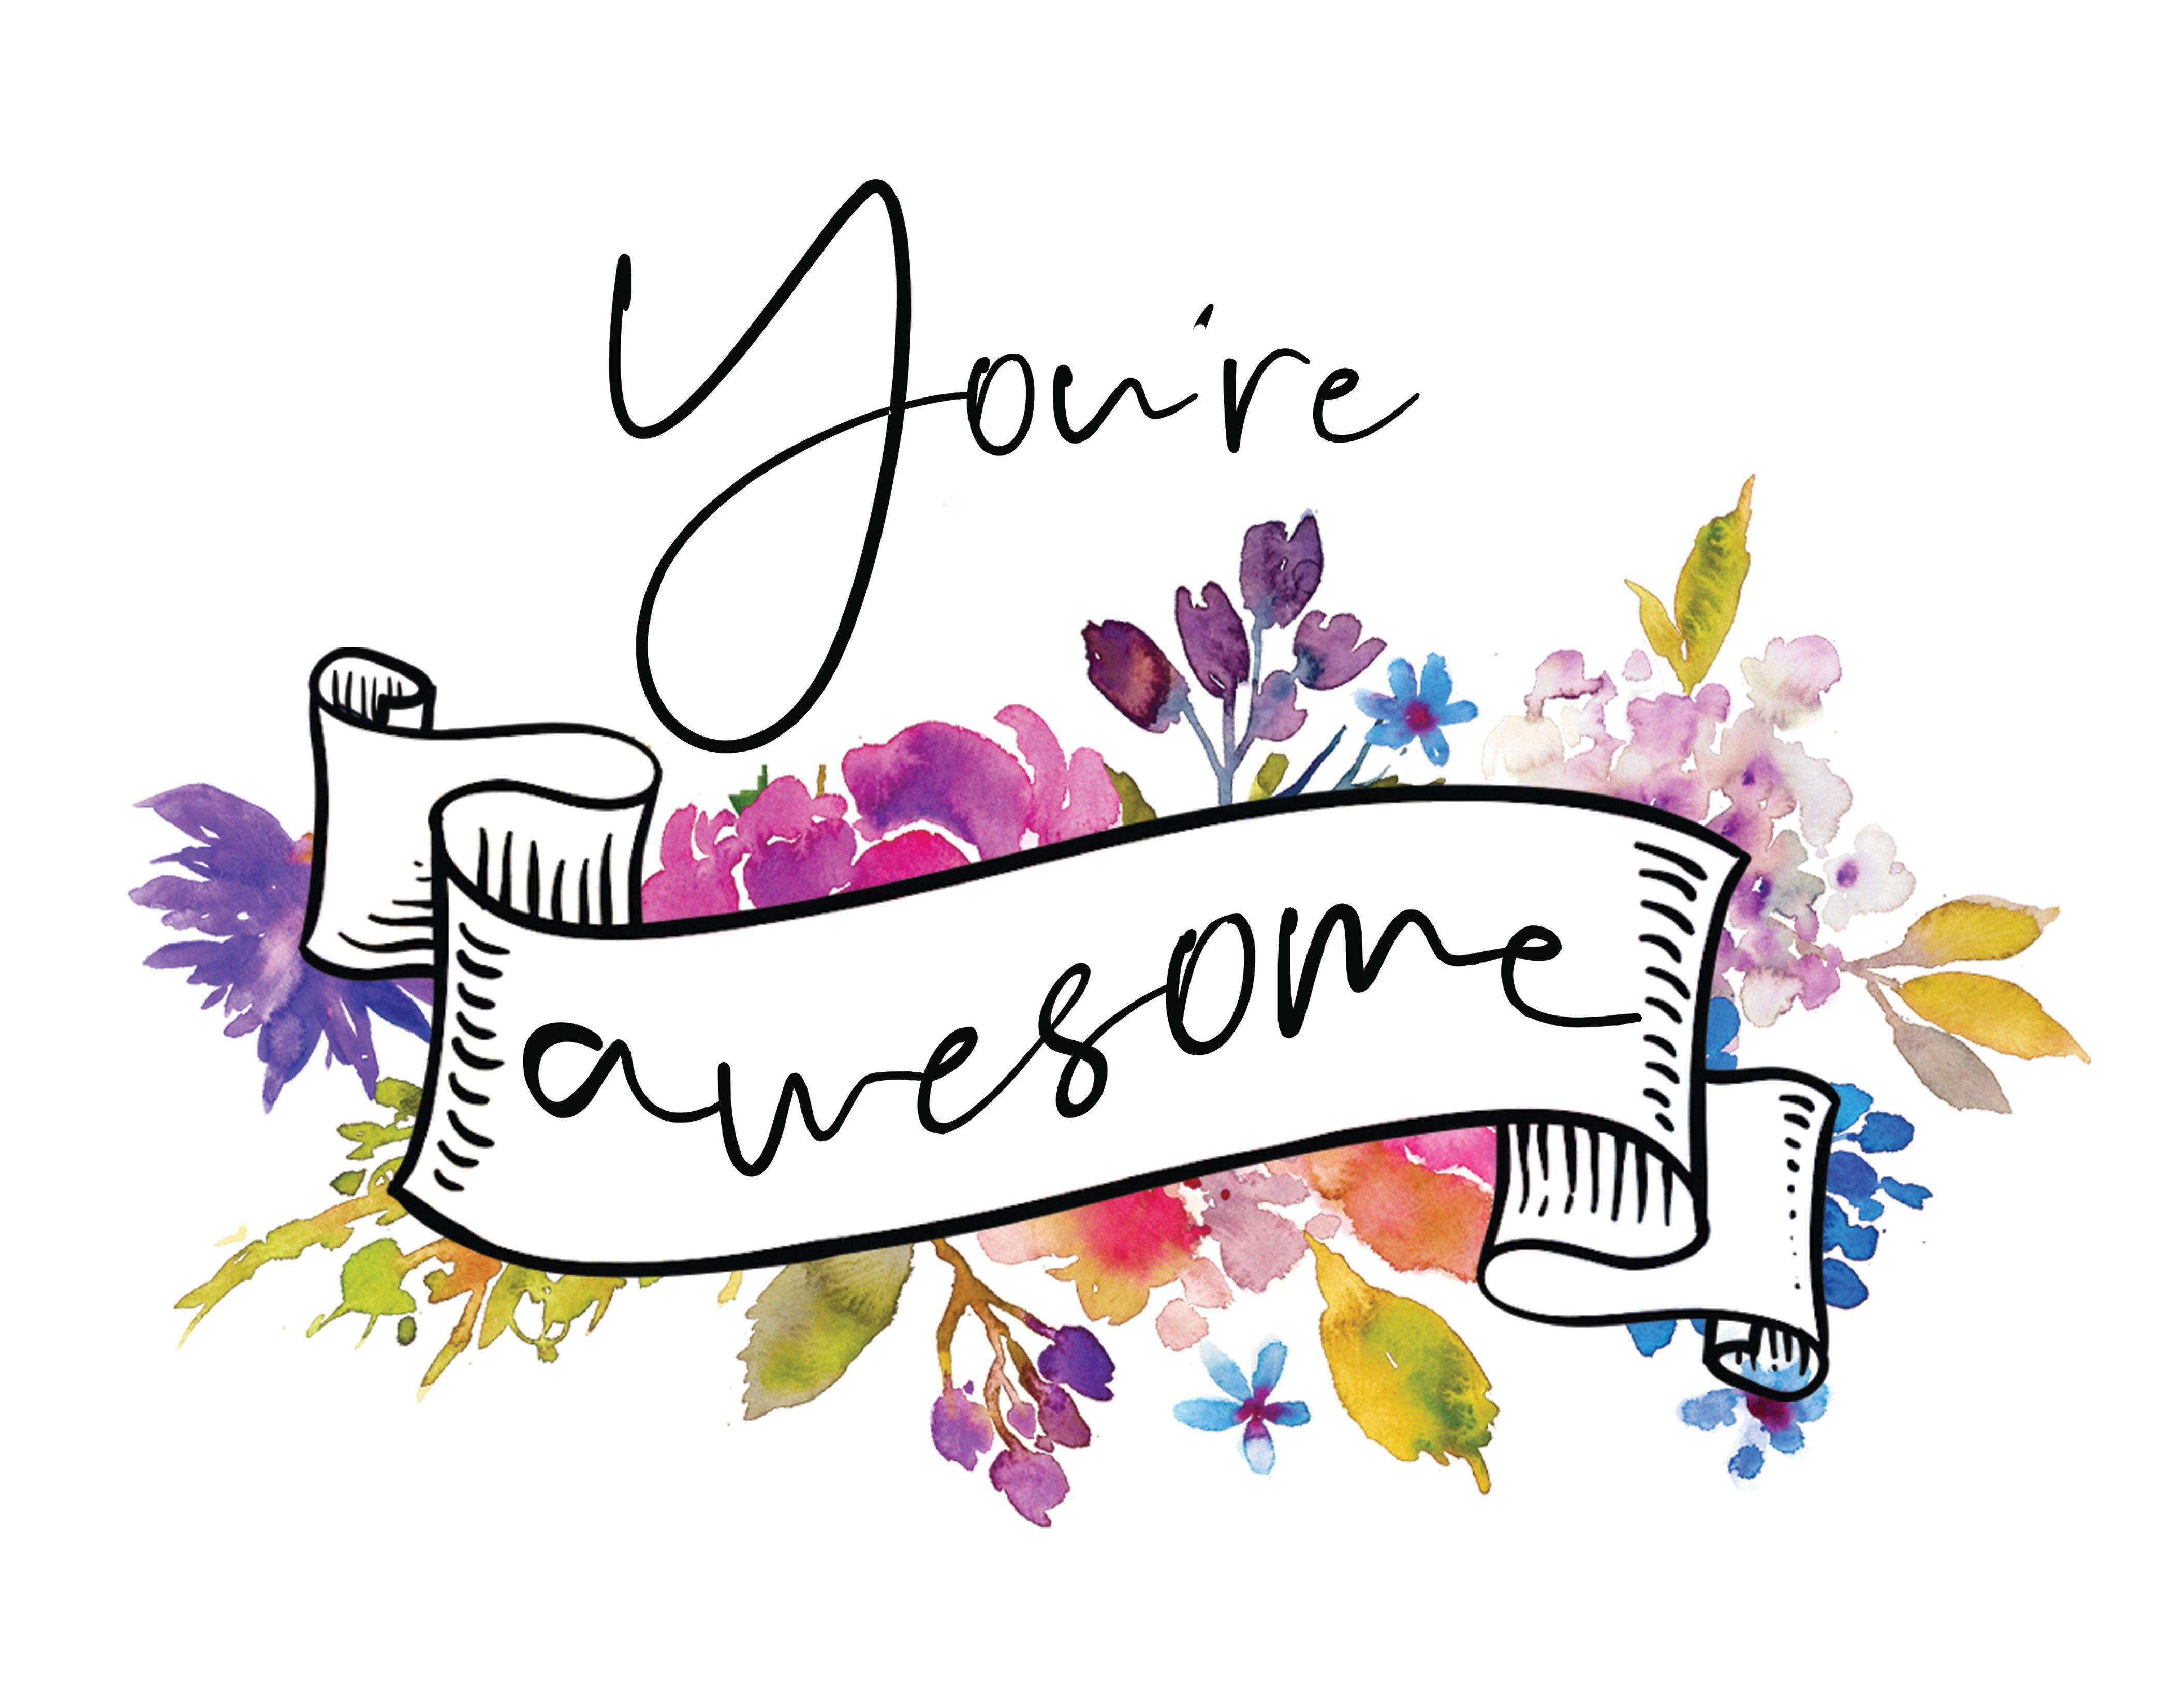 You're awesome! #self-esteem #employeeappreciation